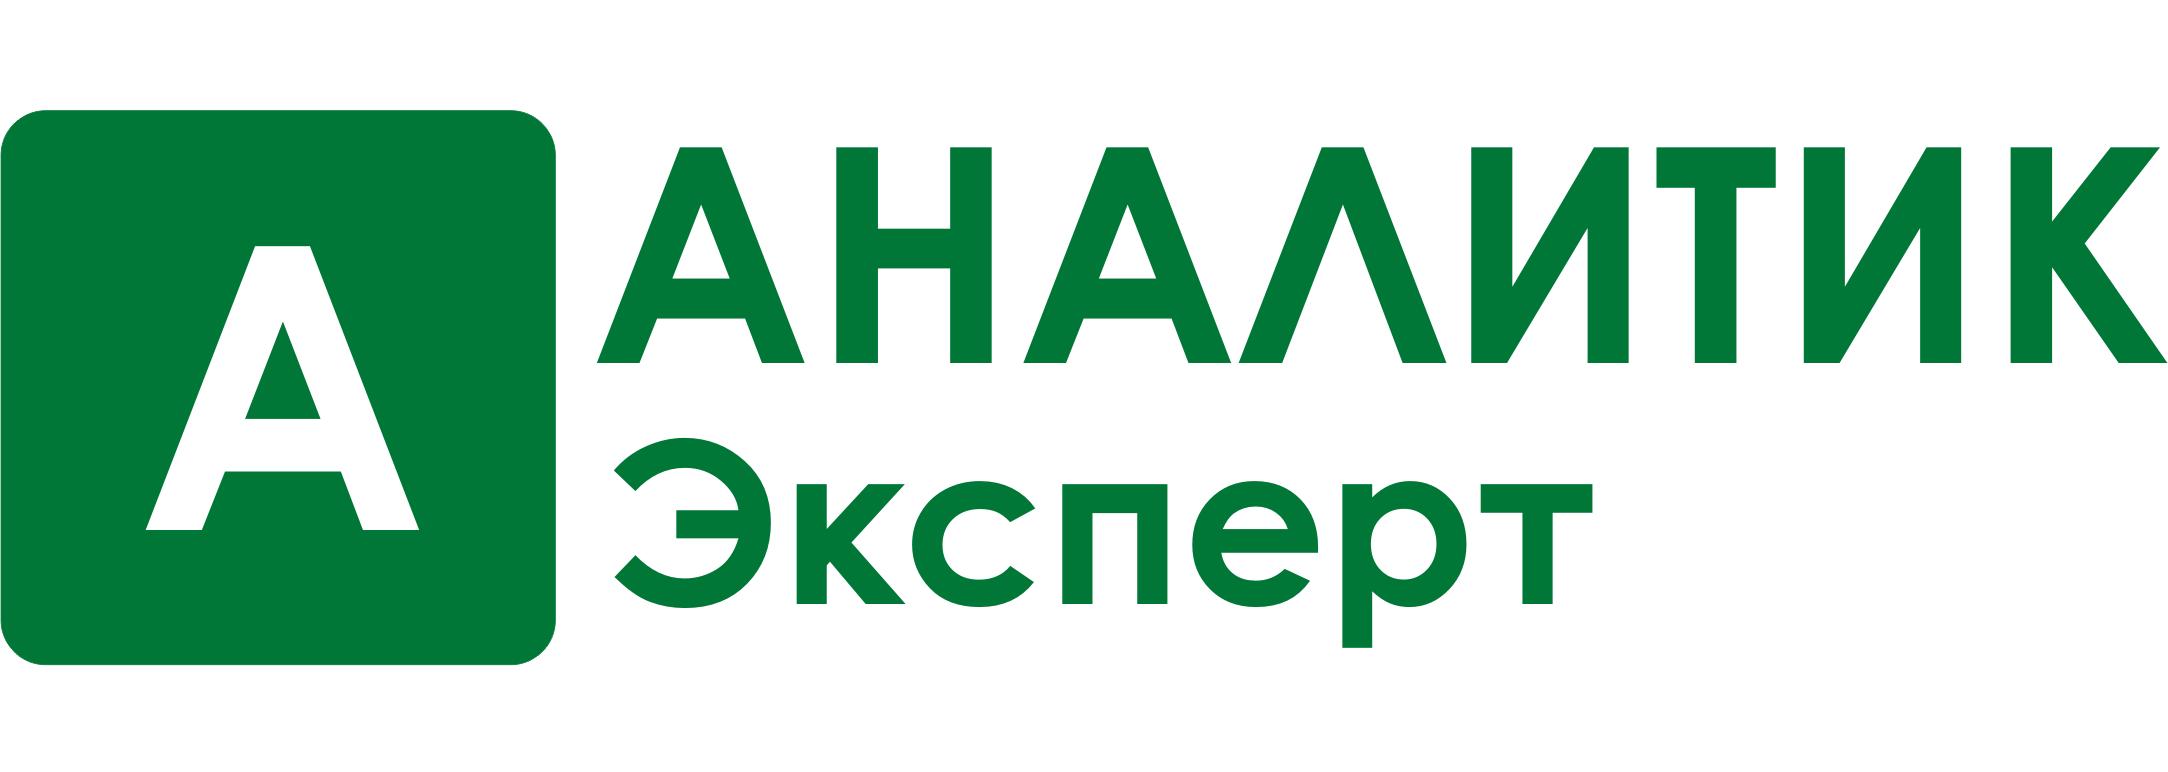 ООО «Аналитик Эксперт»